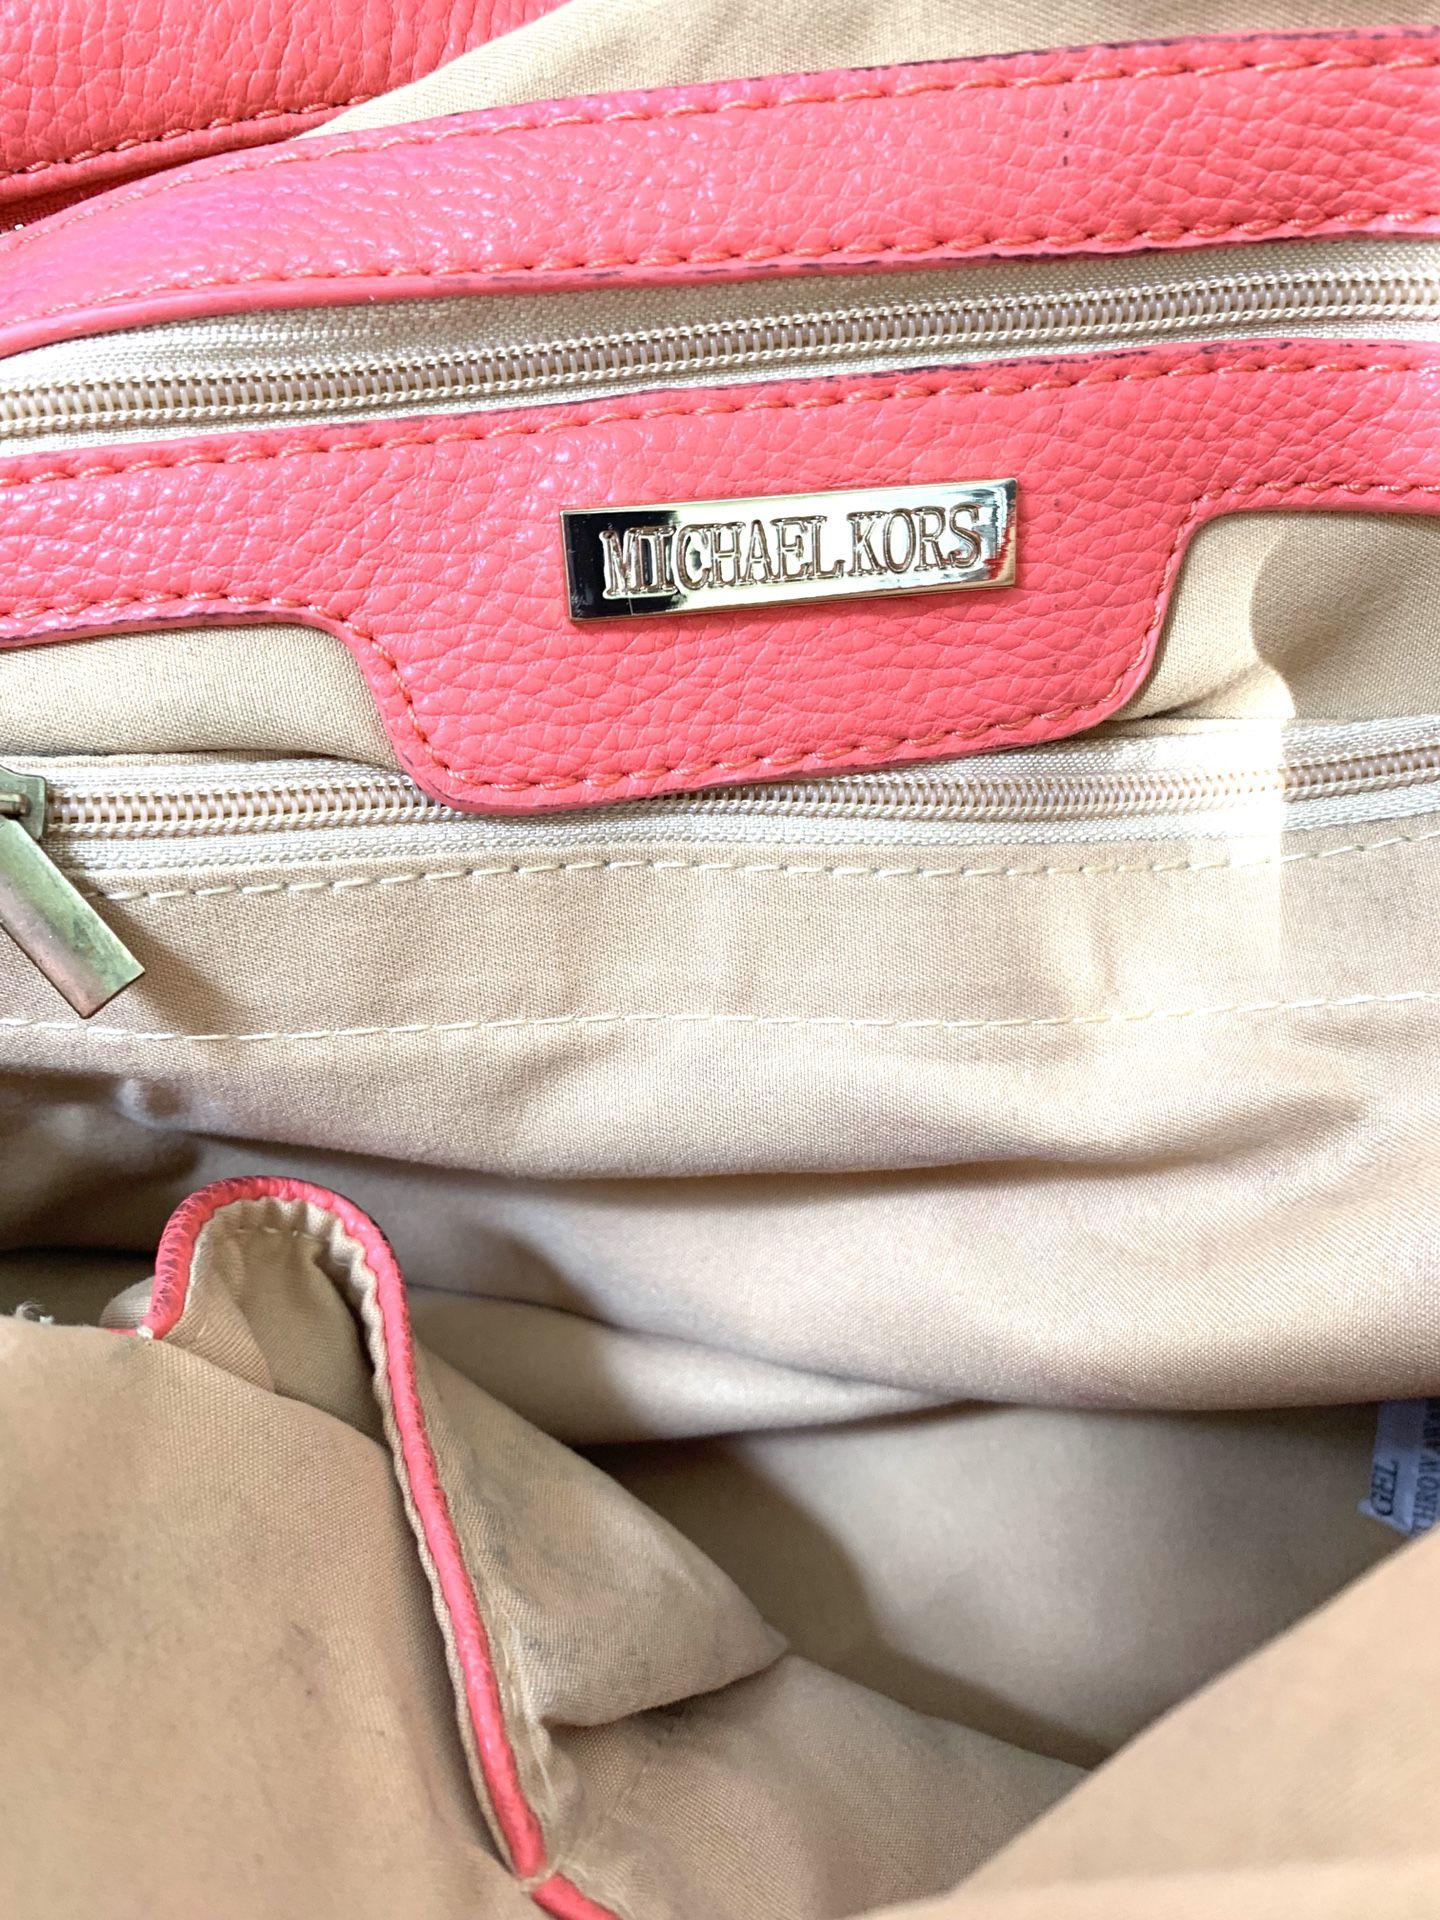 Michael Kors bag ladies purse brand new